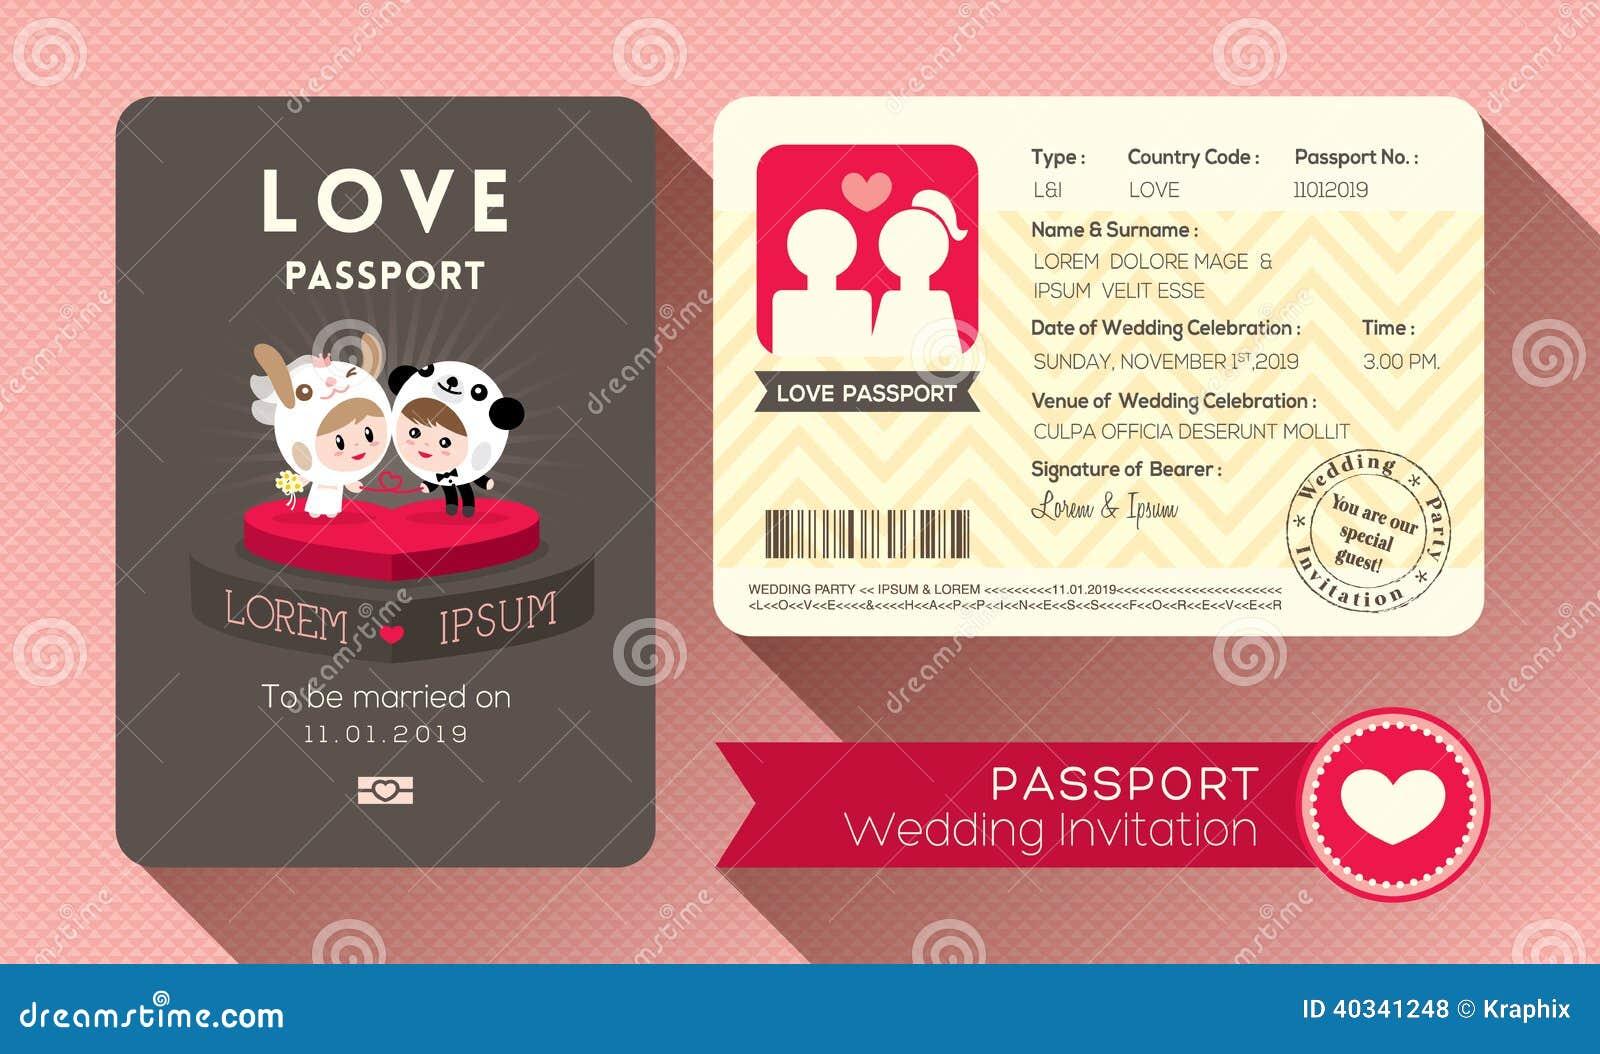 Boarding Pass Wedding Invitations is beautiful invitation ideas